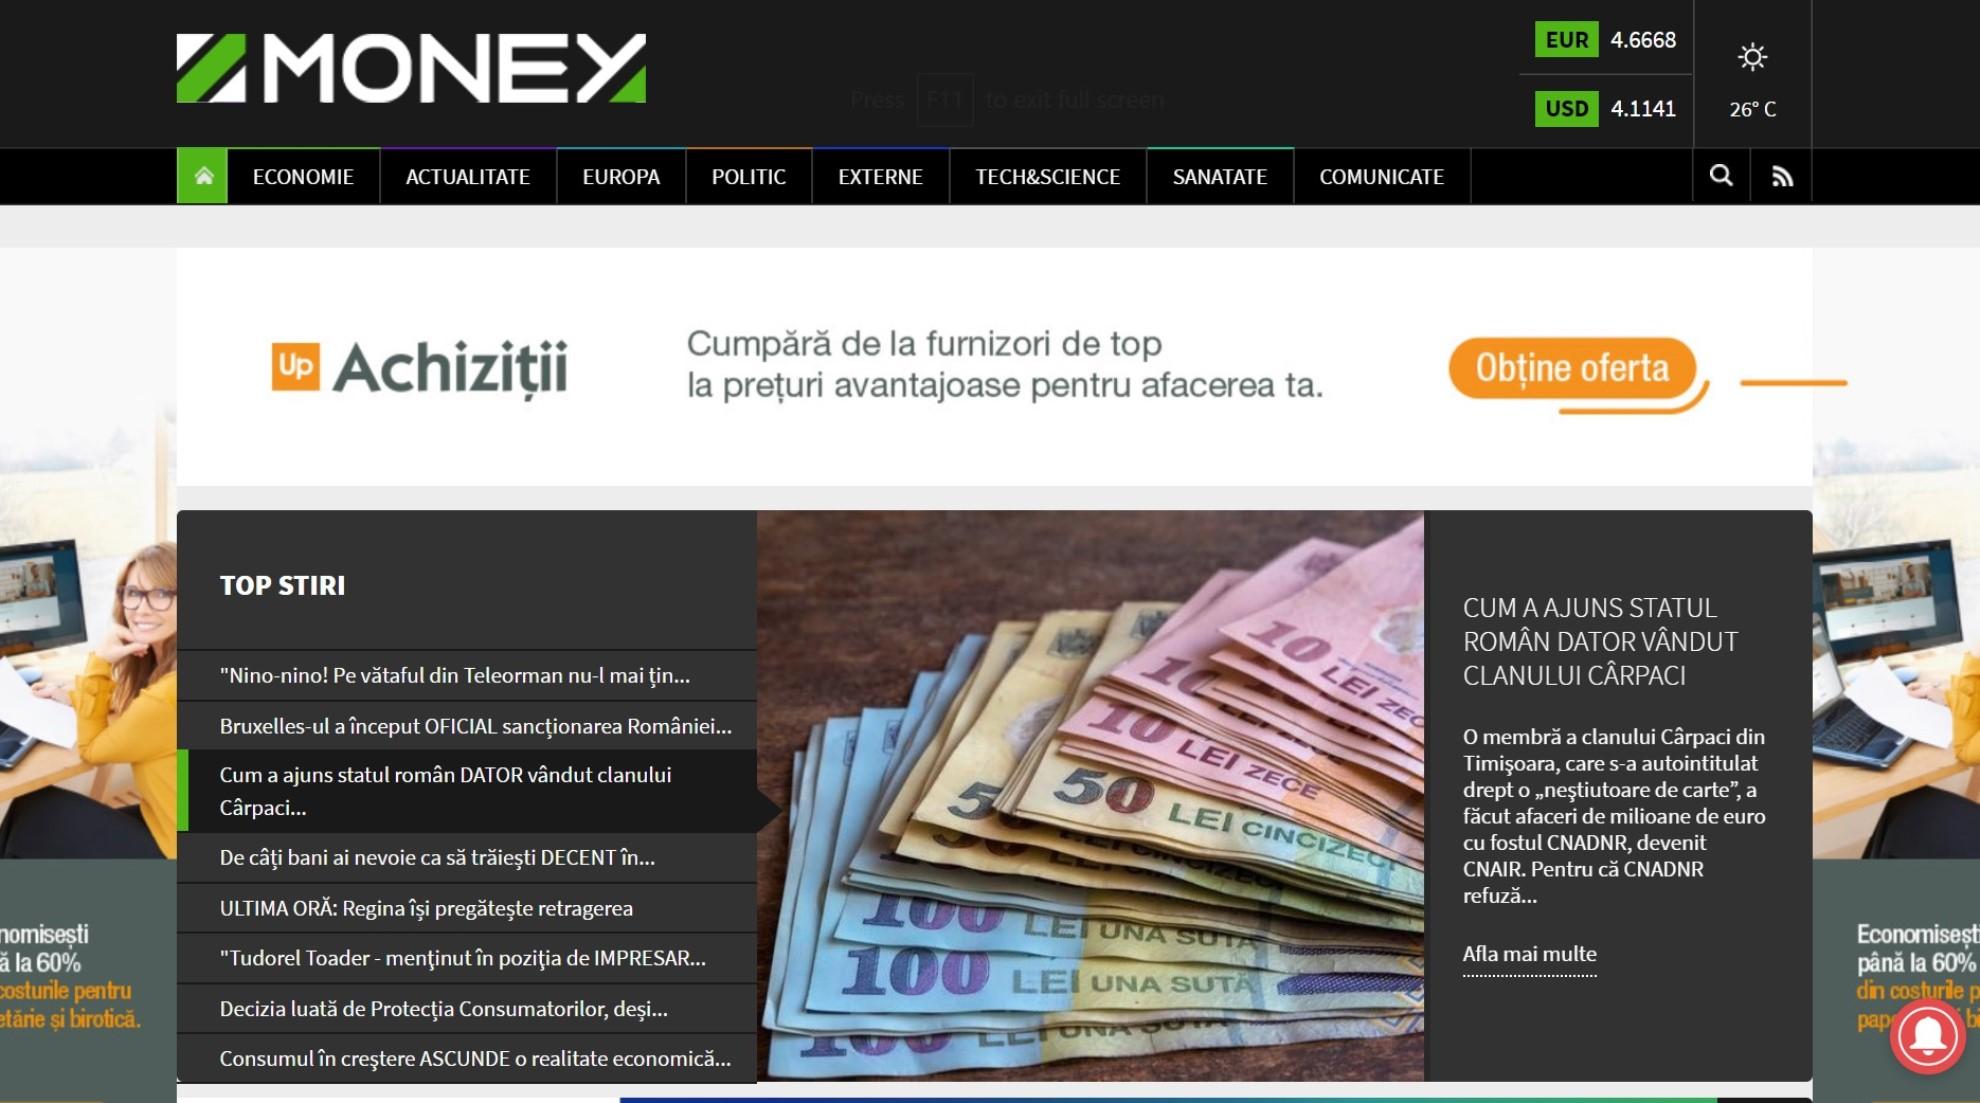 Portal de stiri de business, analize, comentarii, calculator credite, fonduri europene, burse, banci si companii. Sustinut editorial de Money Channel, Business